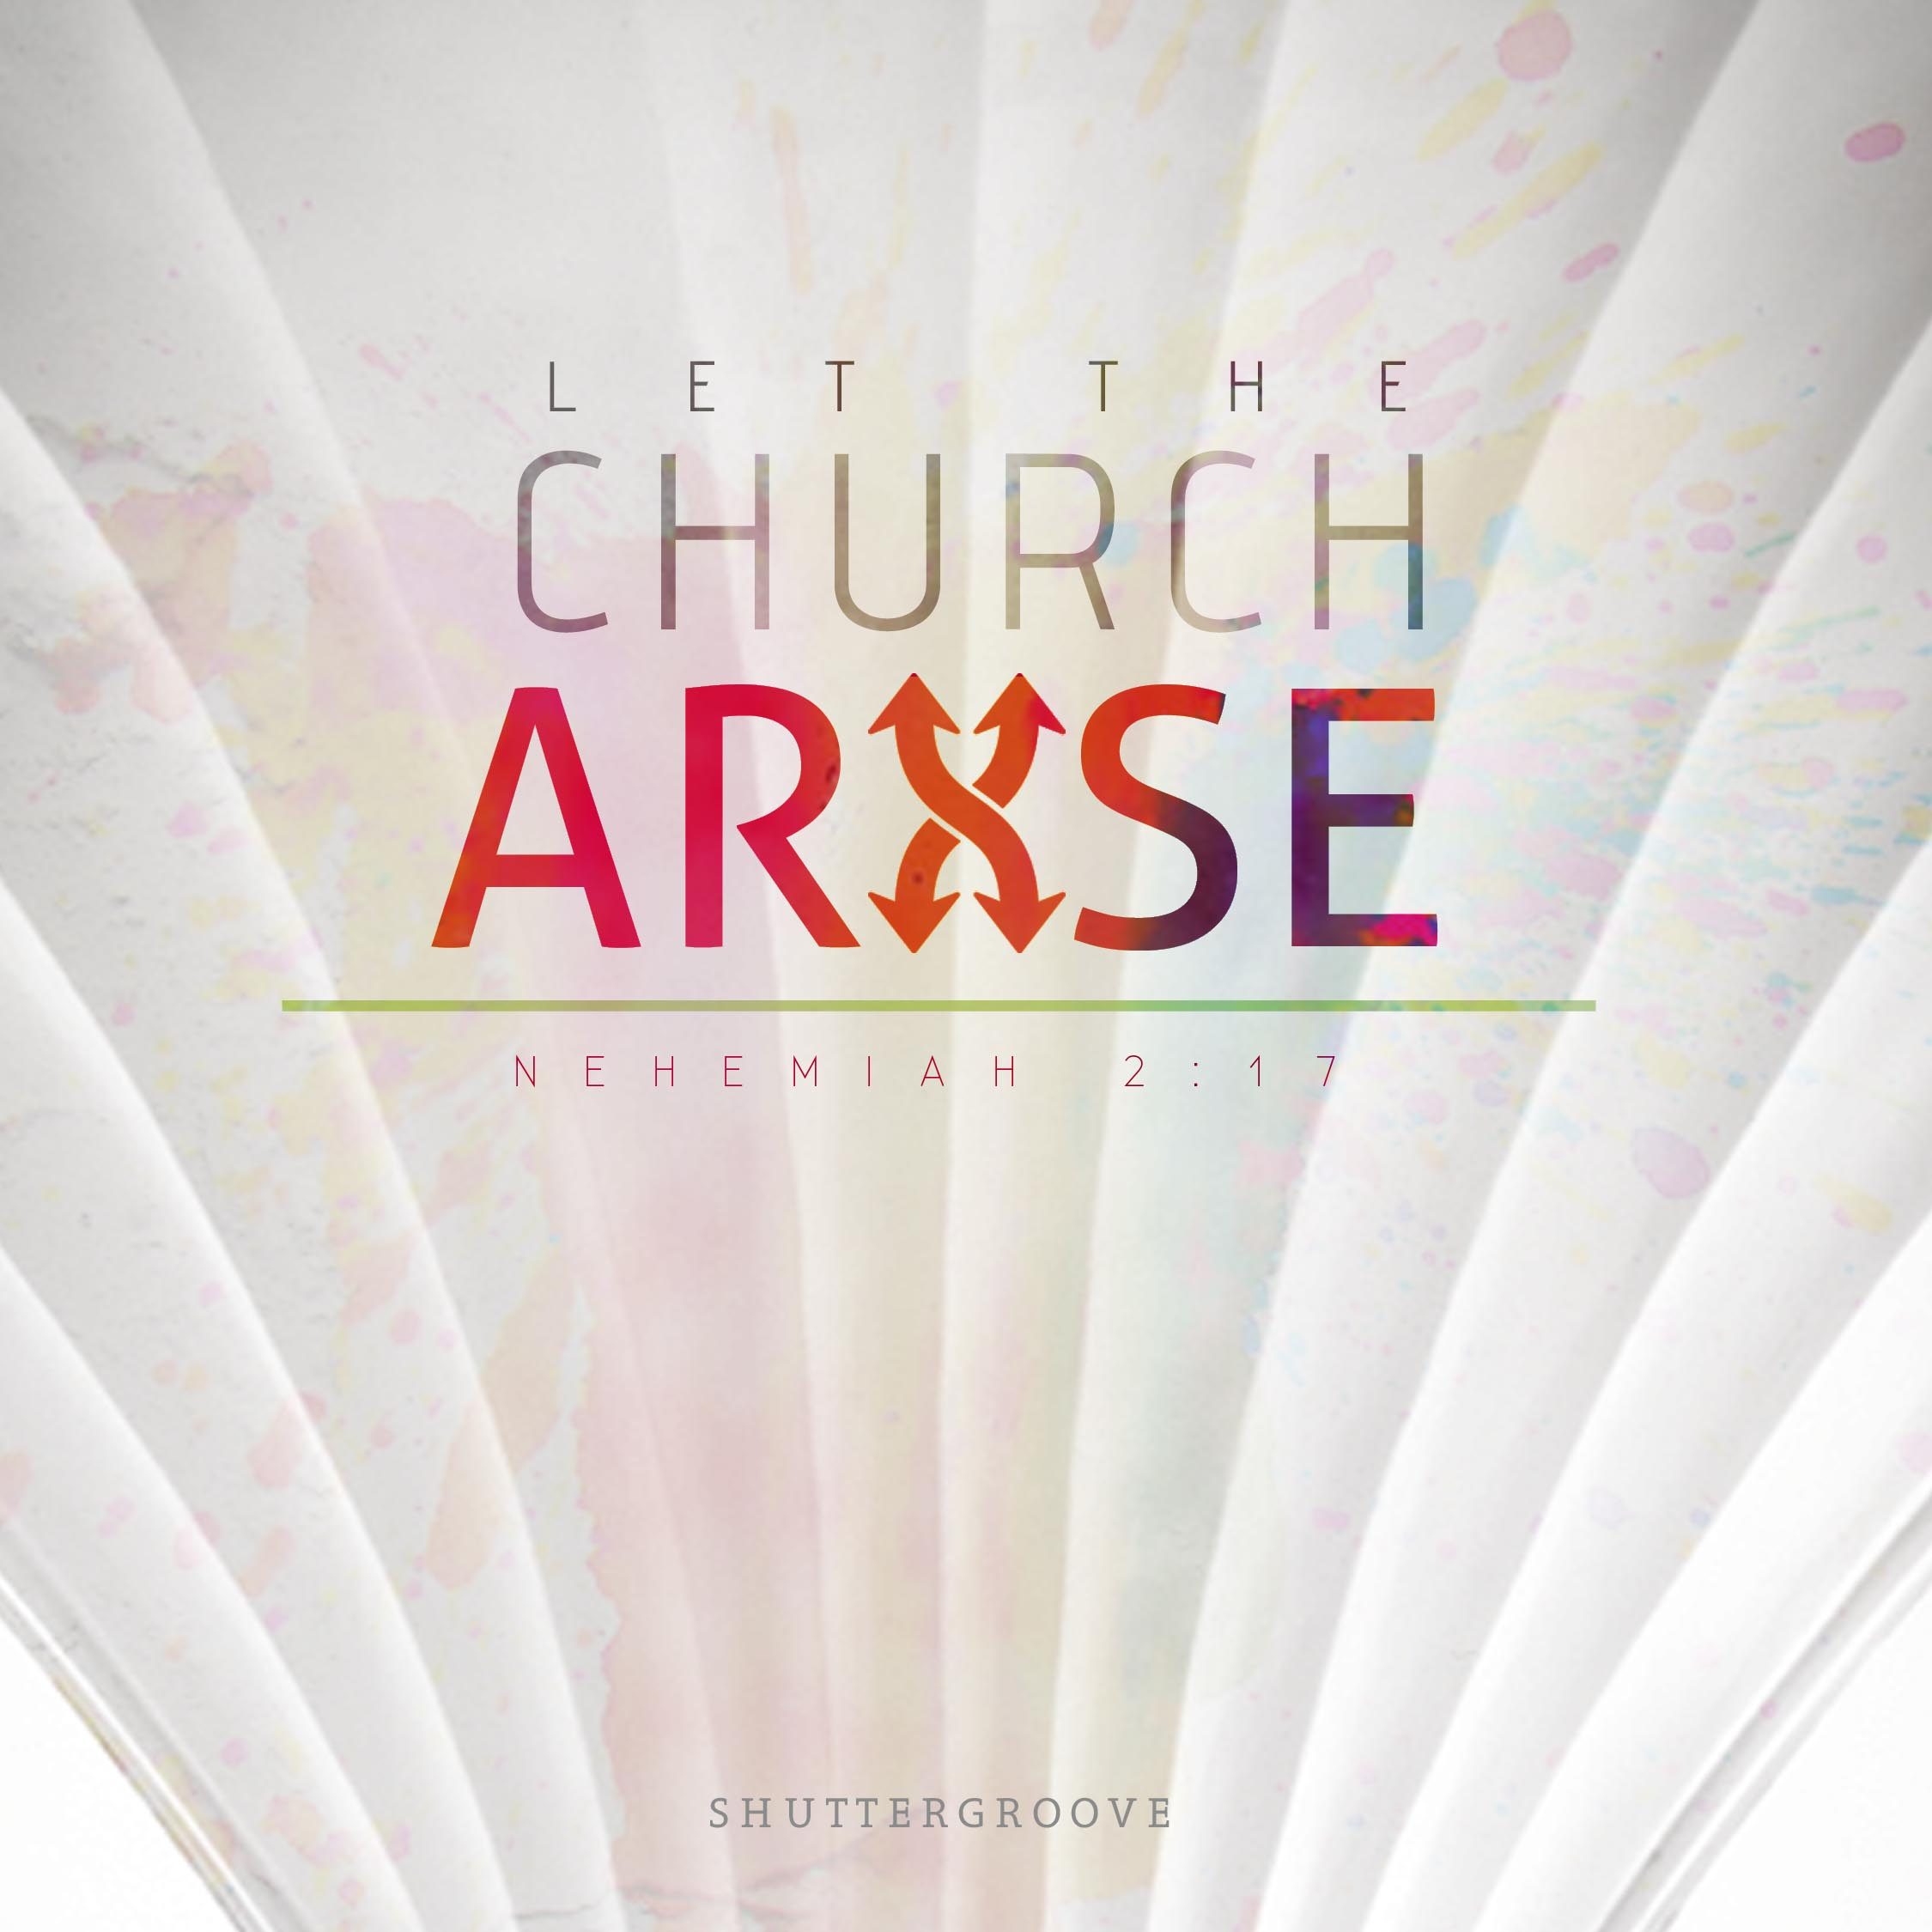 LET THE CHURCH ARISE